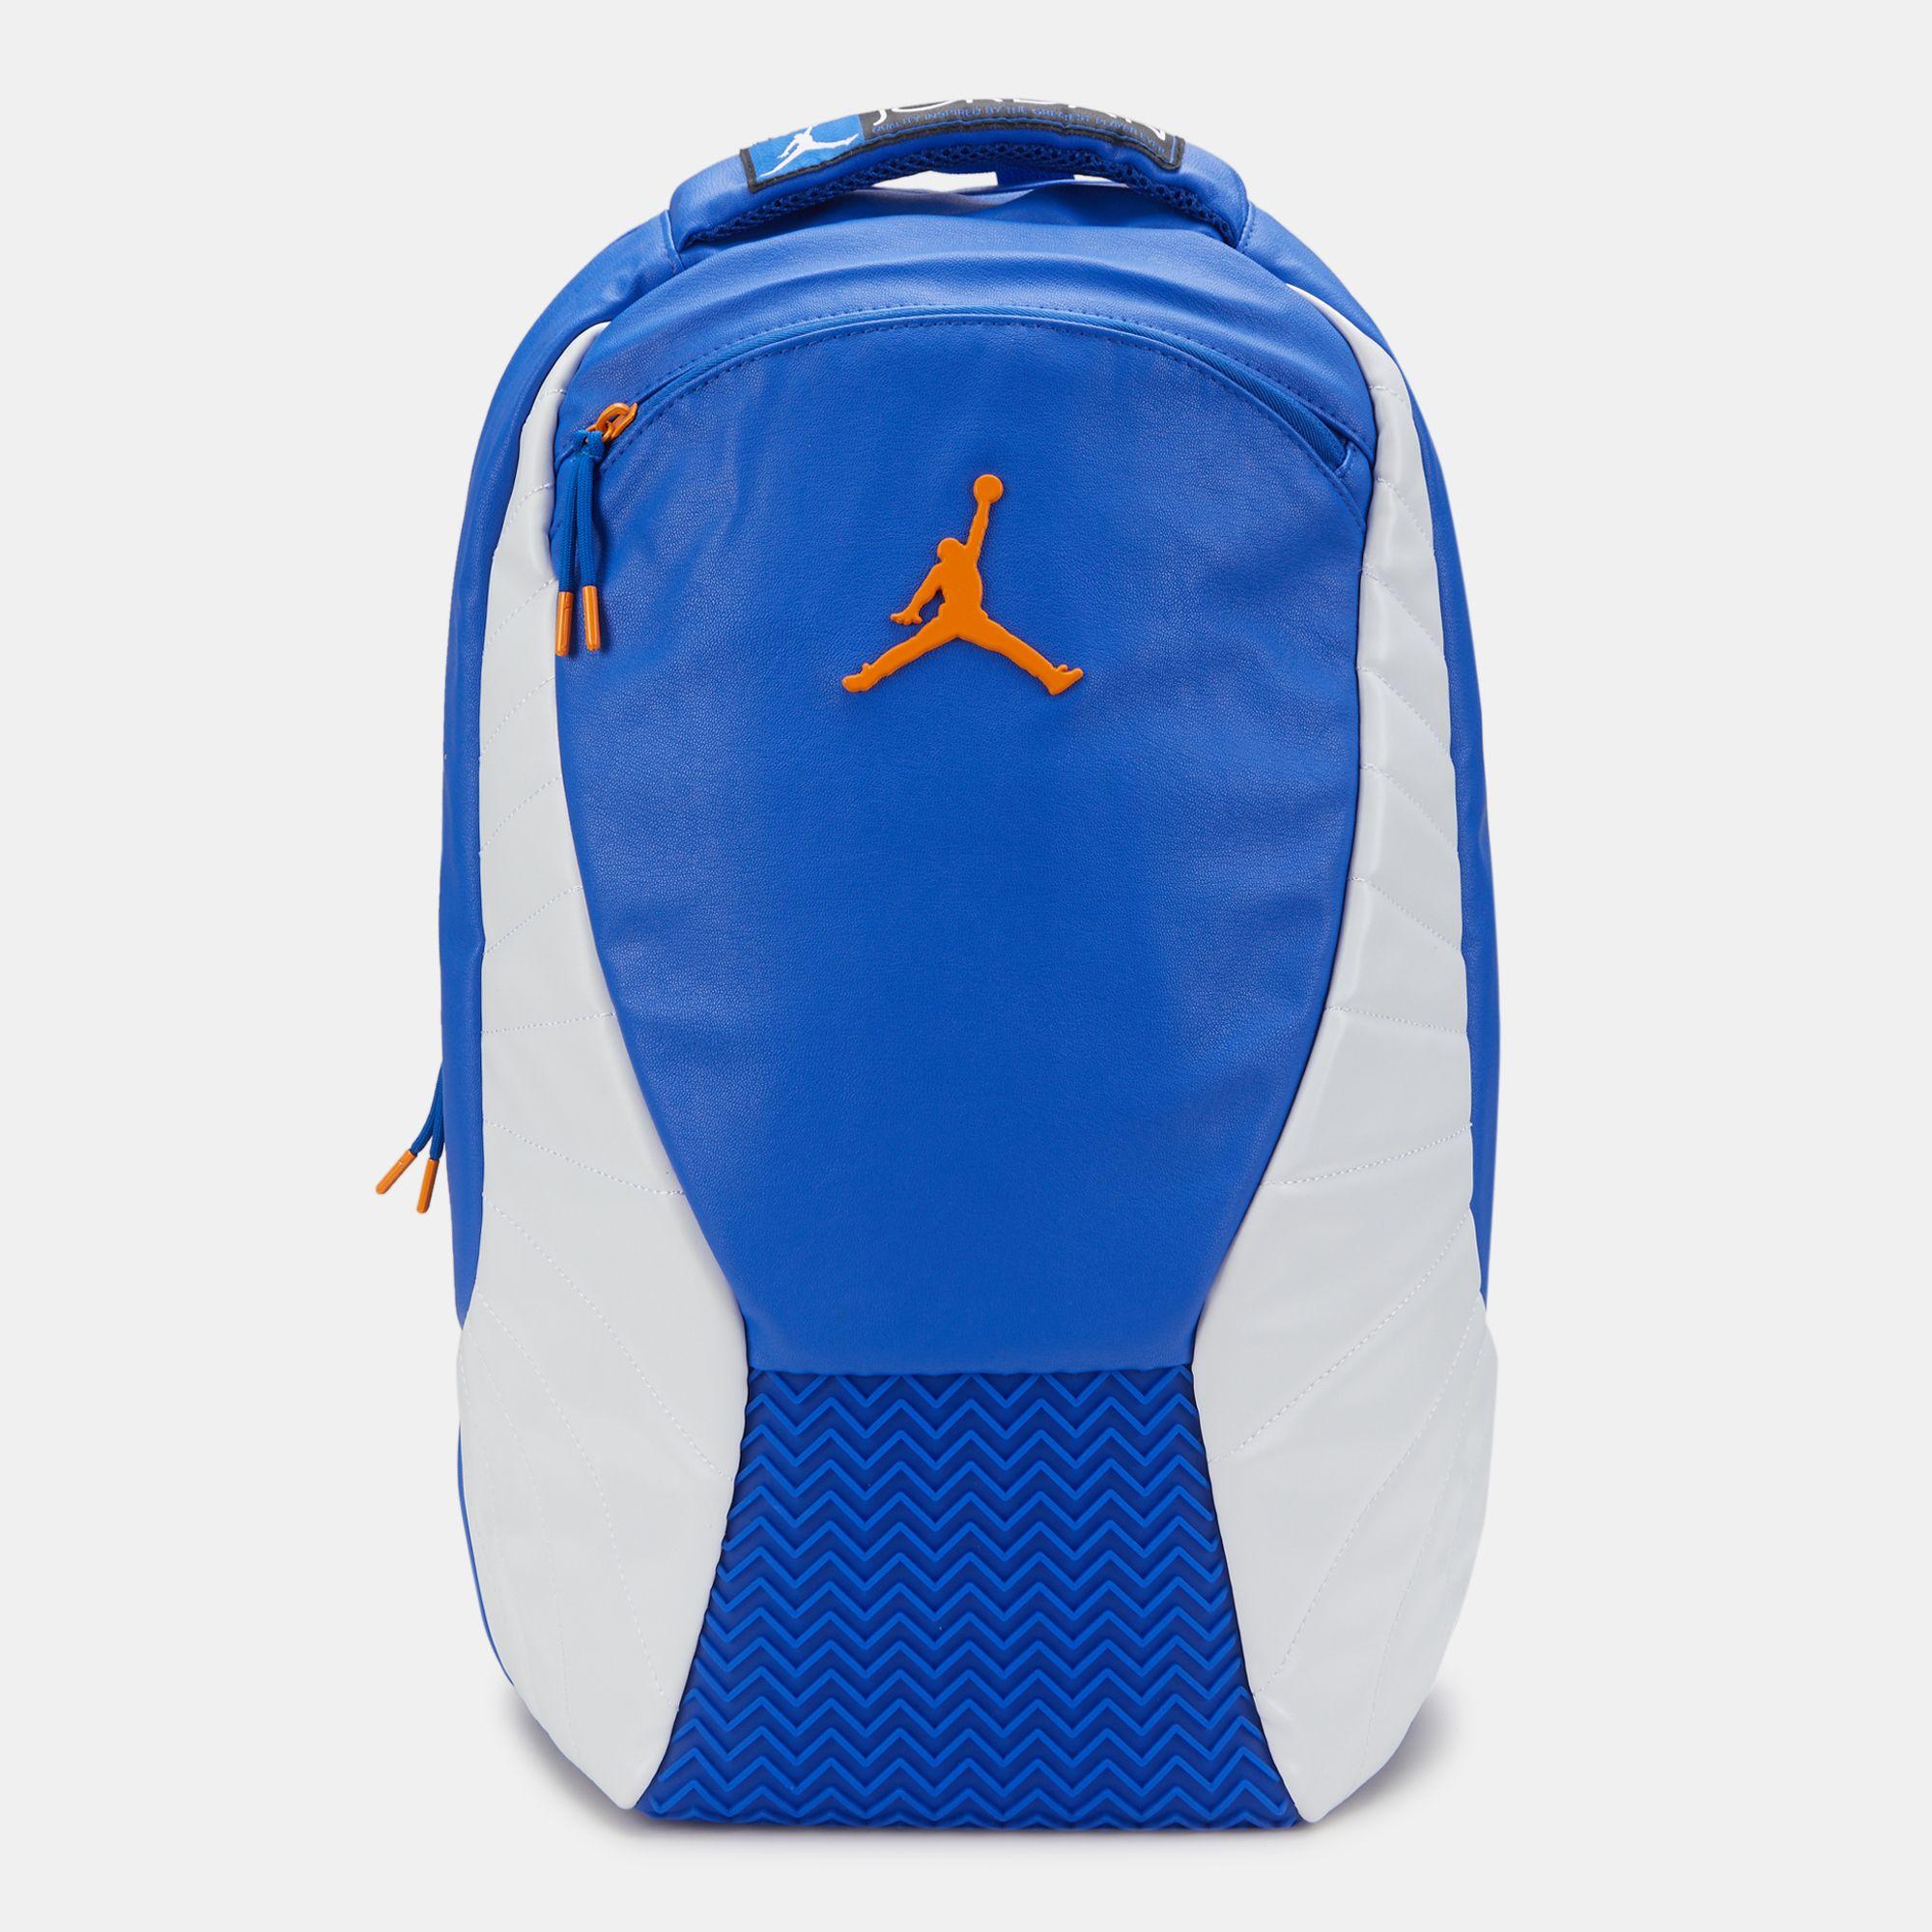 9d5cdaafbd Jordan Kids  Air Jordan 12 Retro Backpack (Older Kids) - Blue